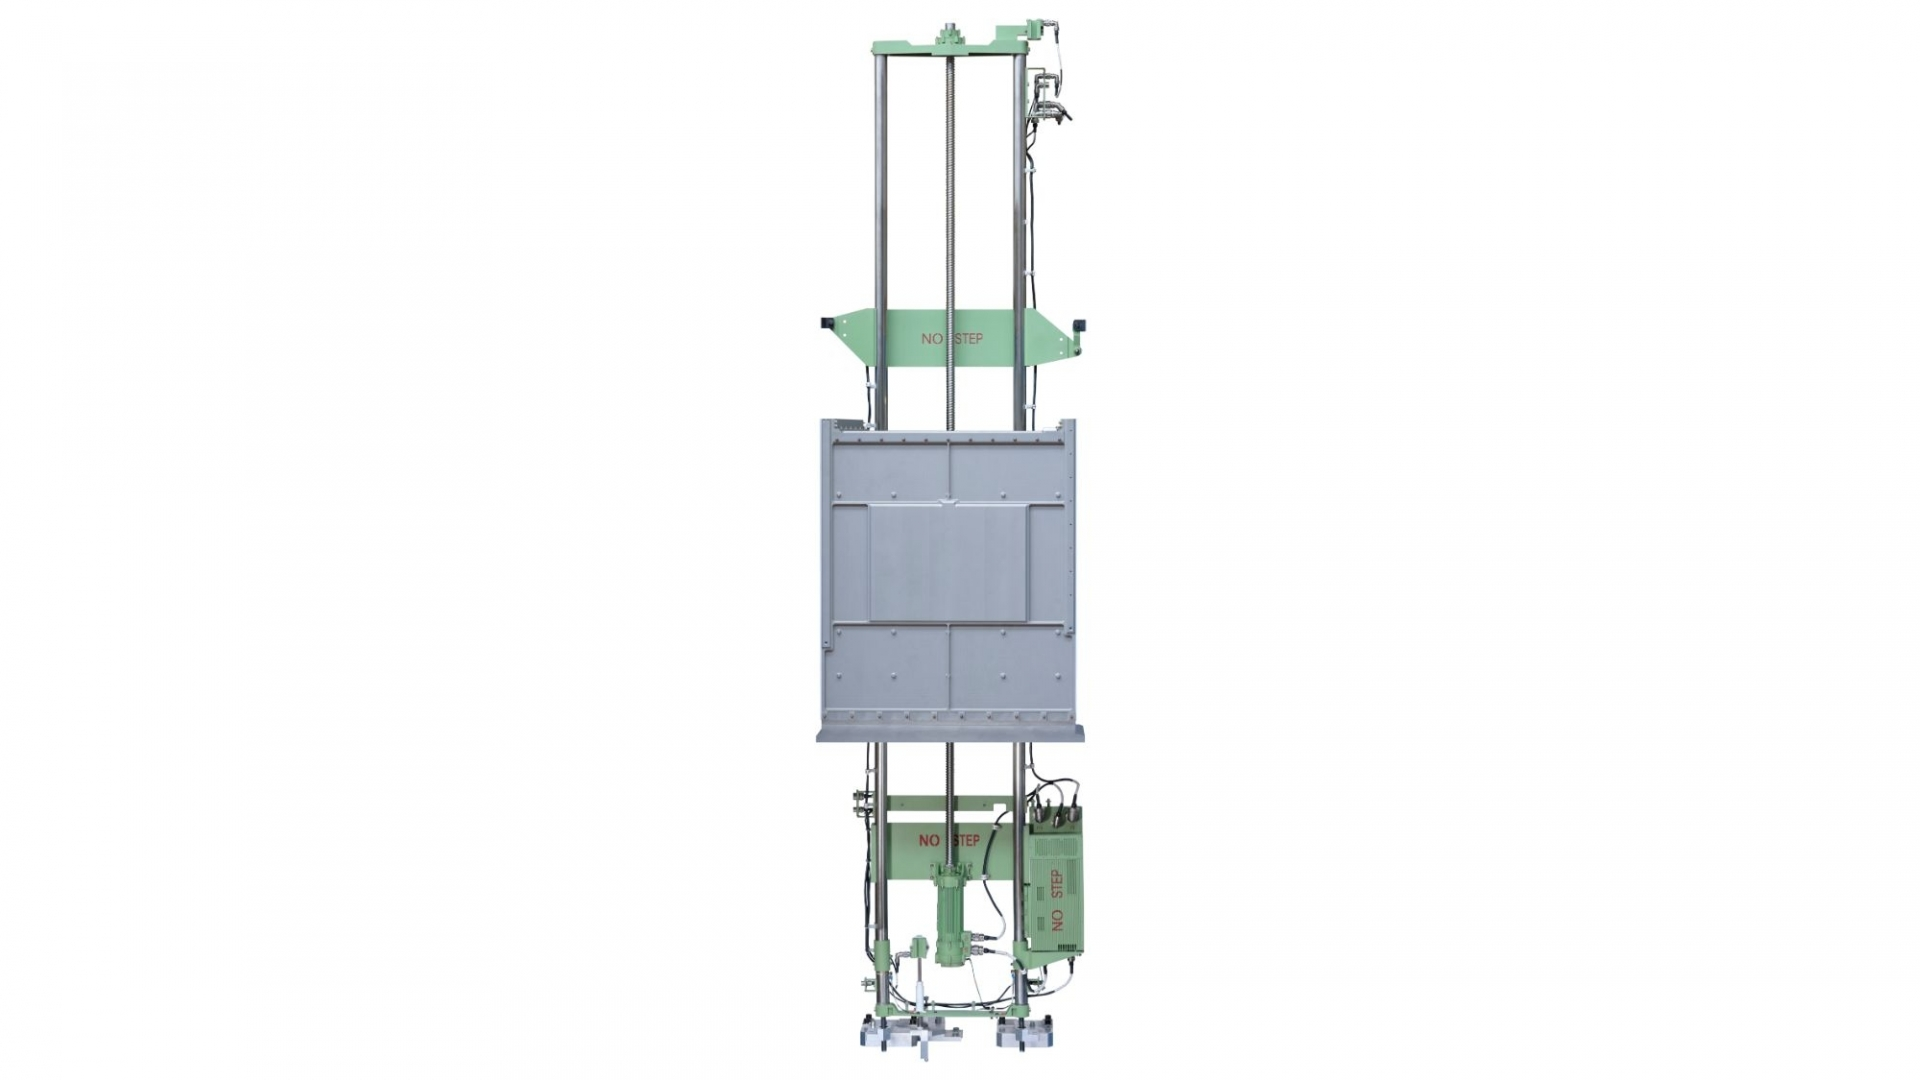 attuatori elettromeccanici umbragroup